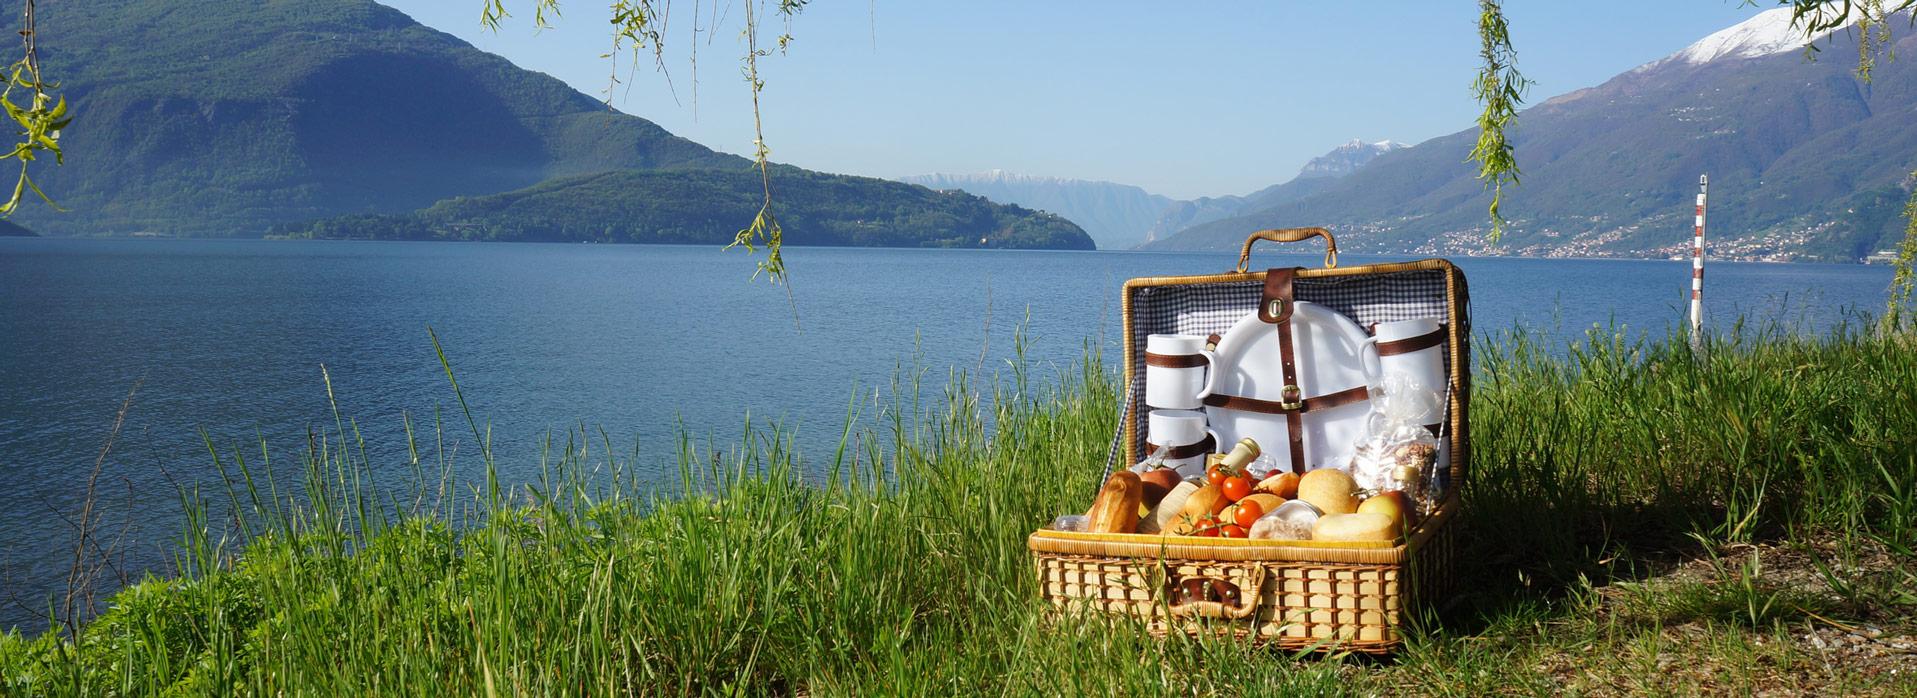 Ein Picknickkorb am See mit atemberaubender Kulisse